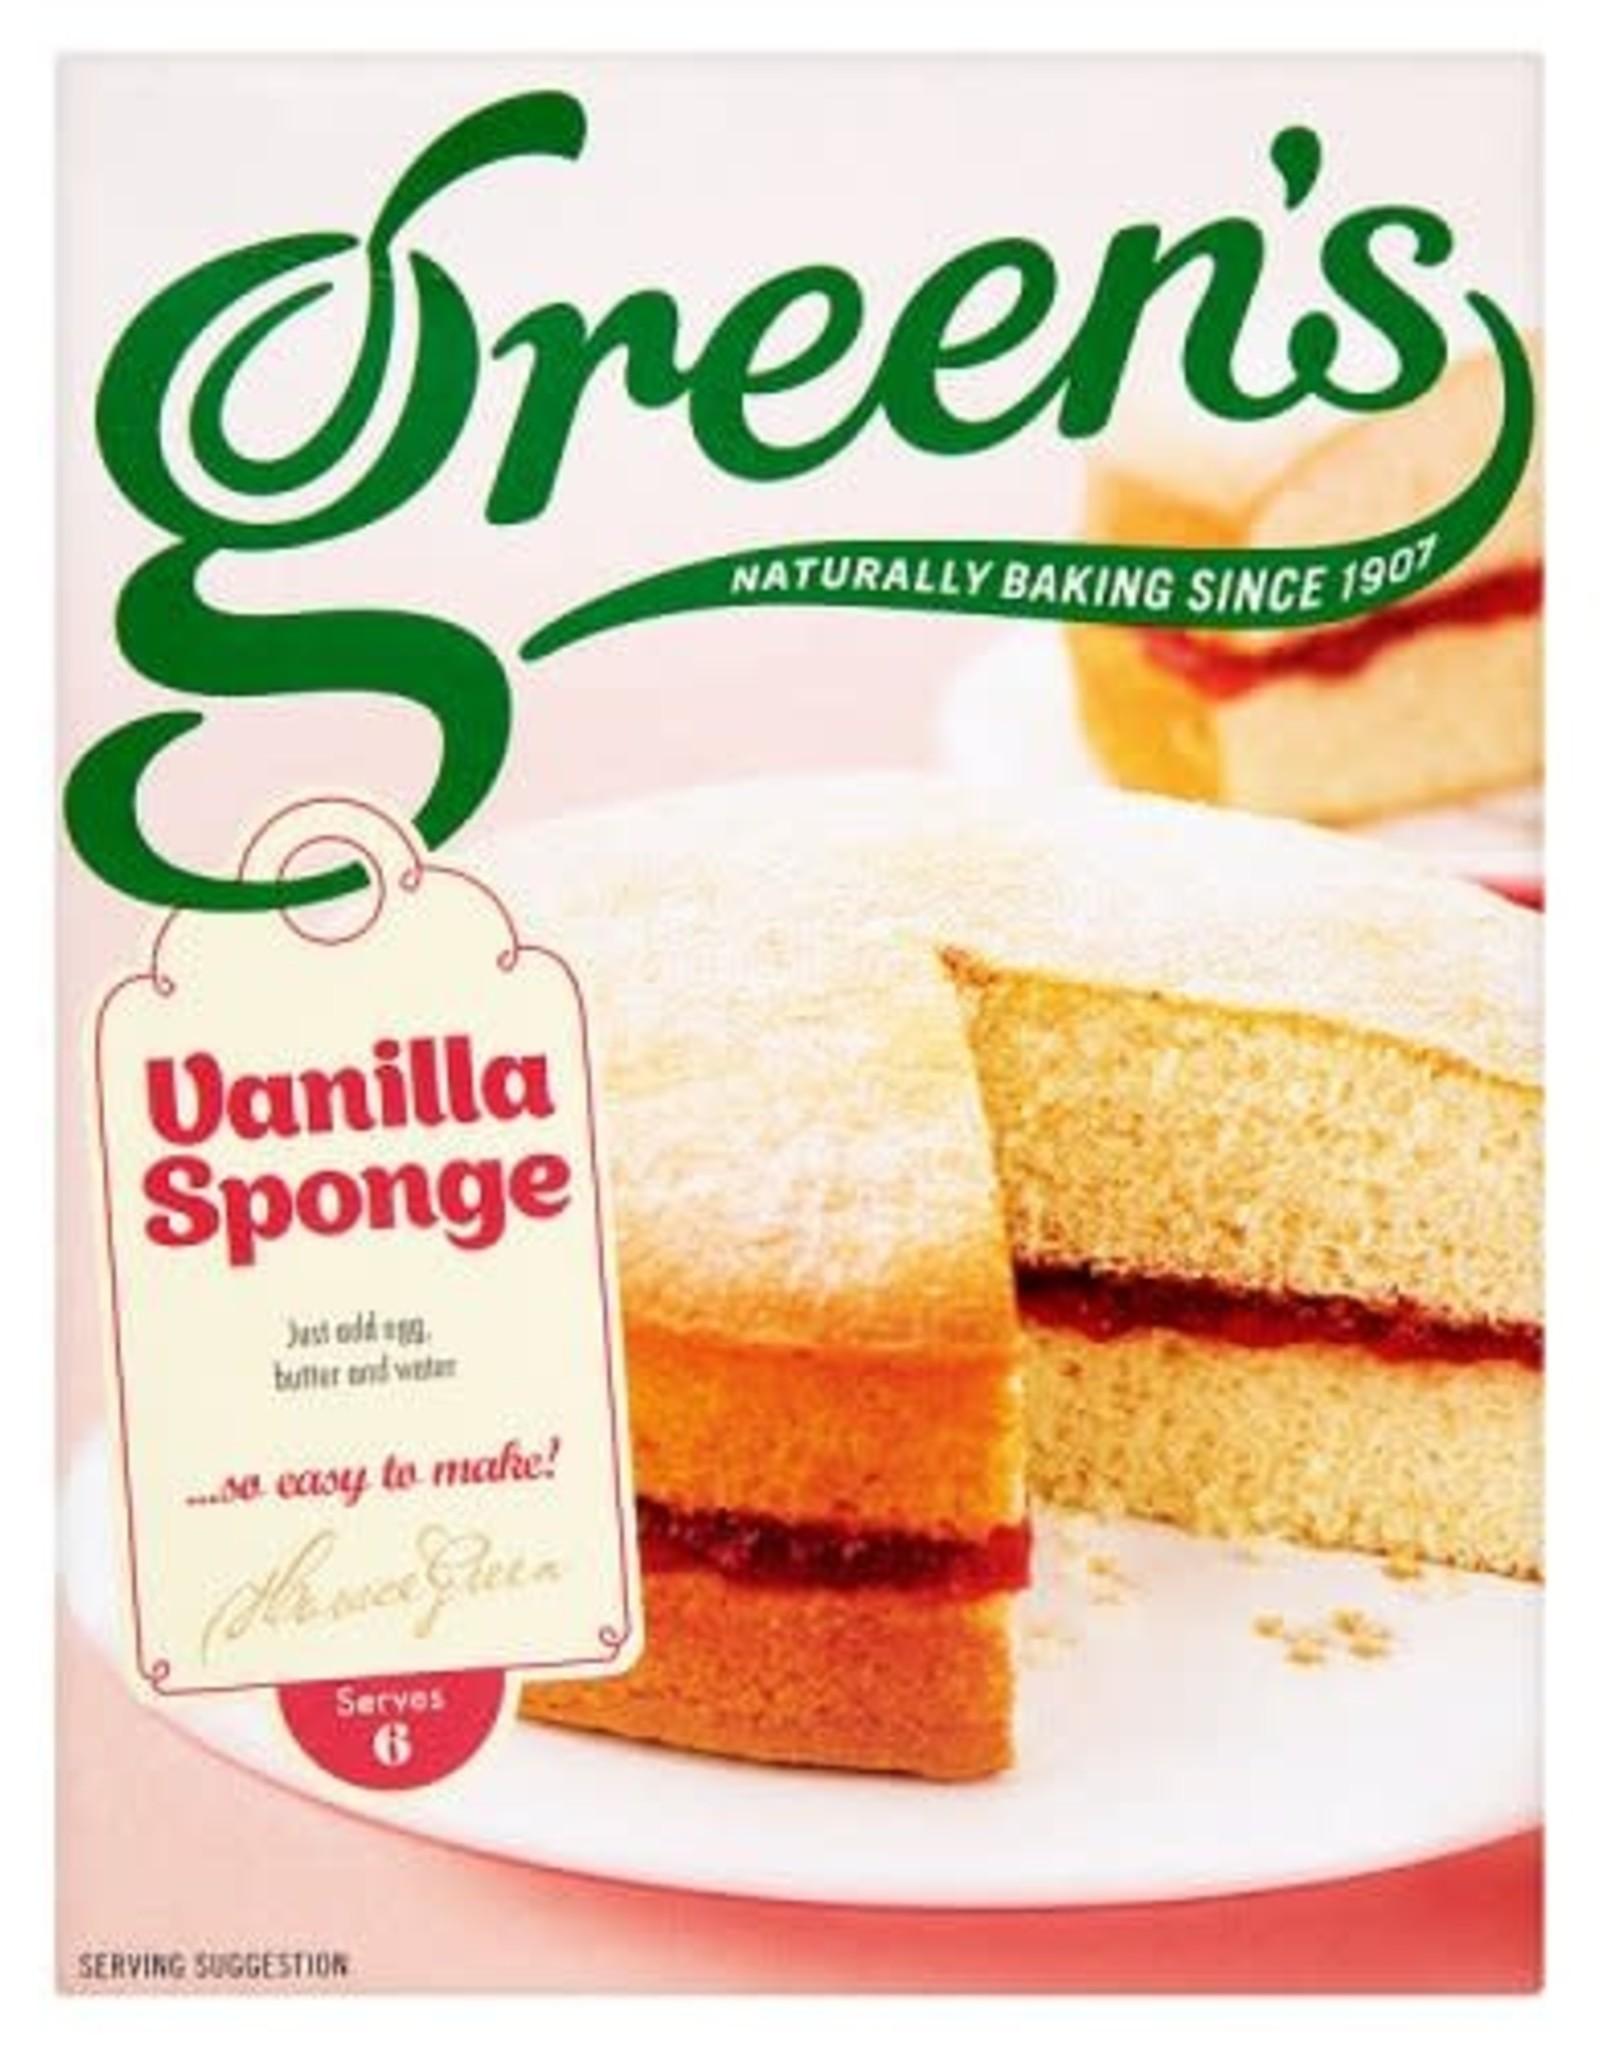 Green's Green's Vanilla Sponge Mix